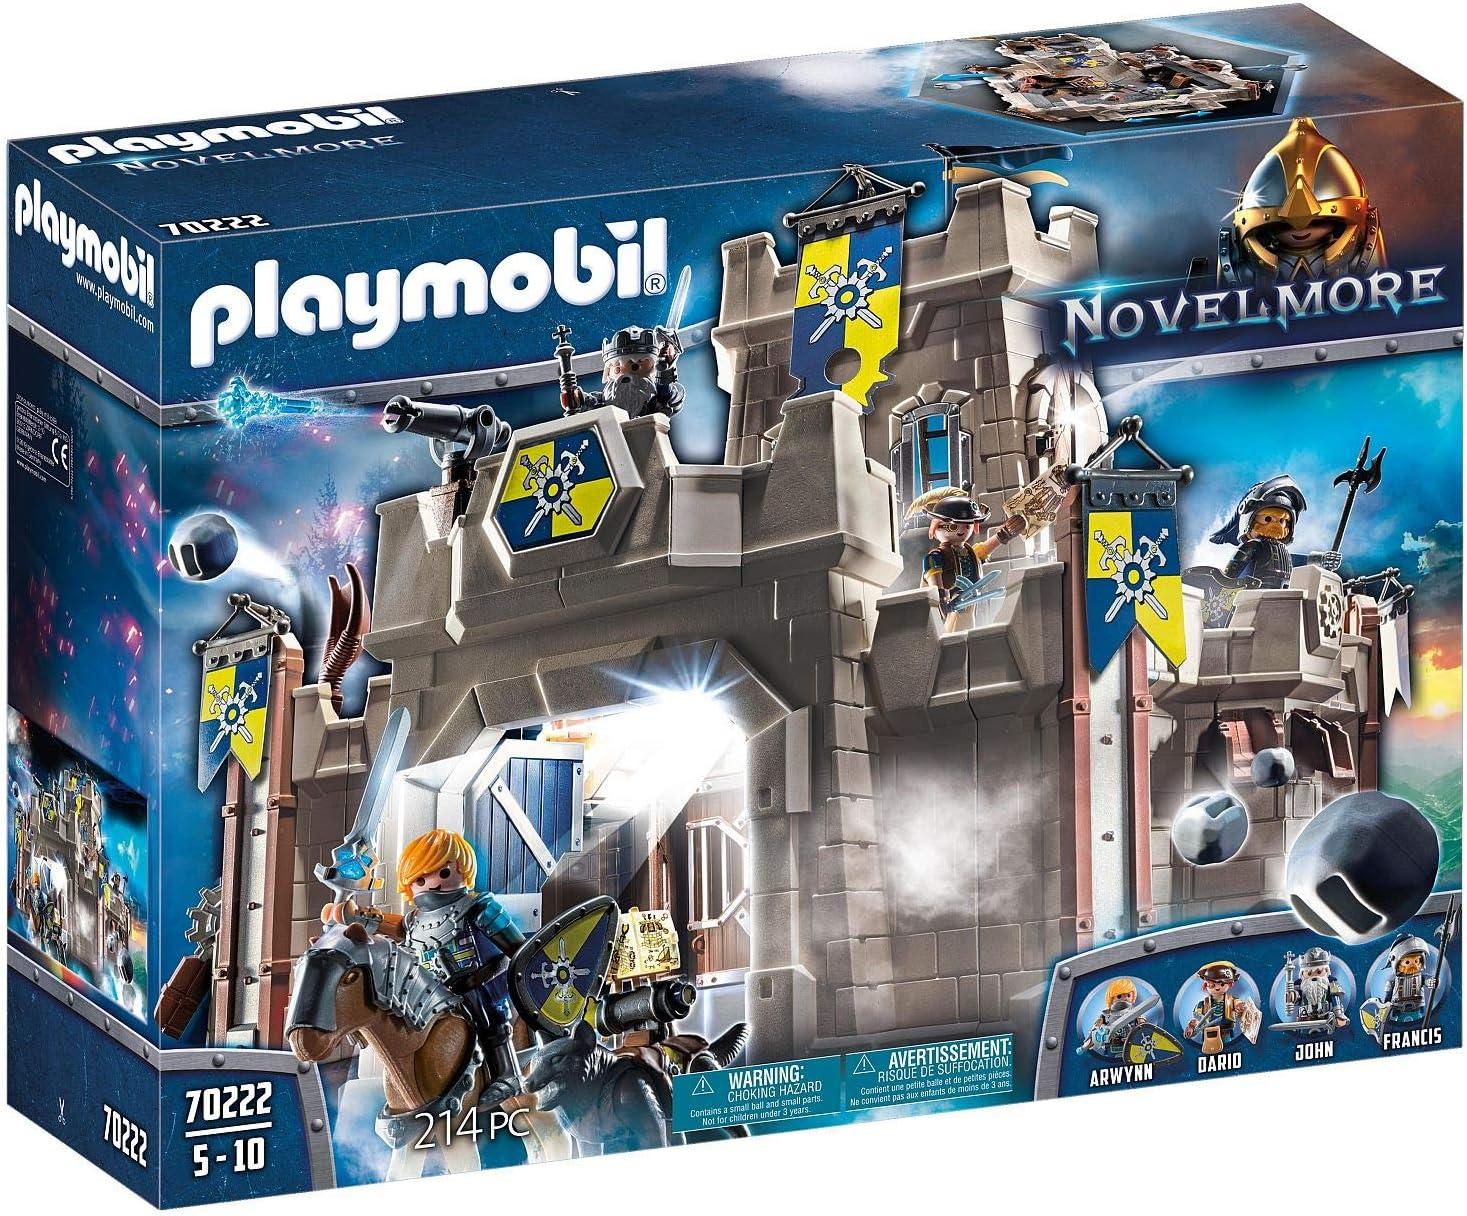 PLAYMOBIL Novelmore Fortaleza, Multicolor (70222)